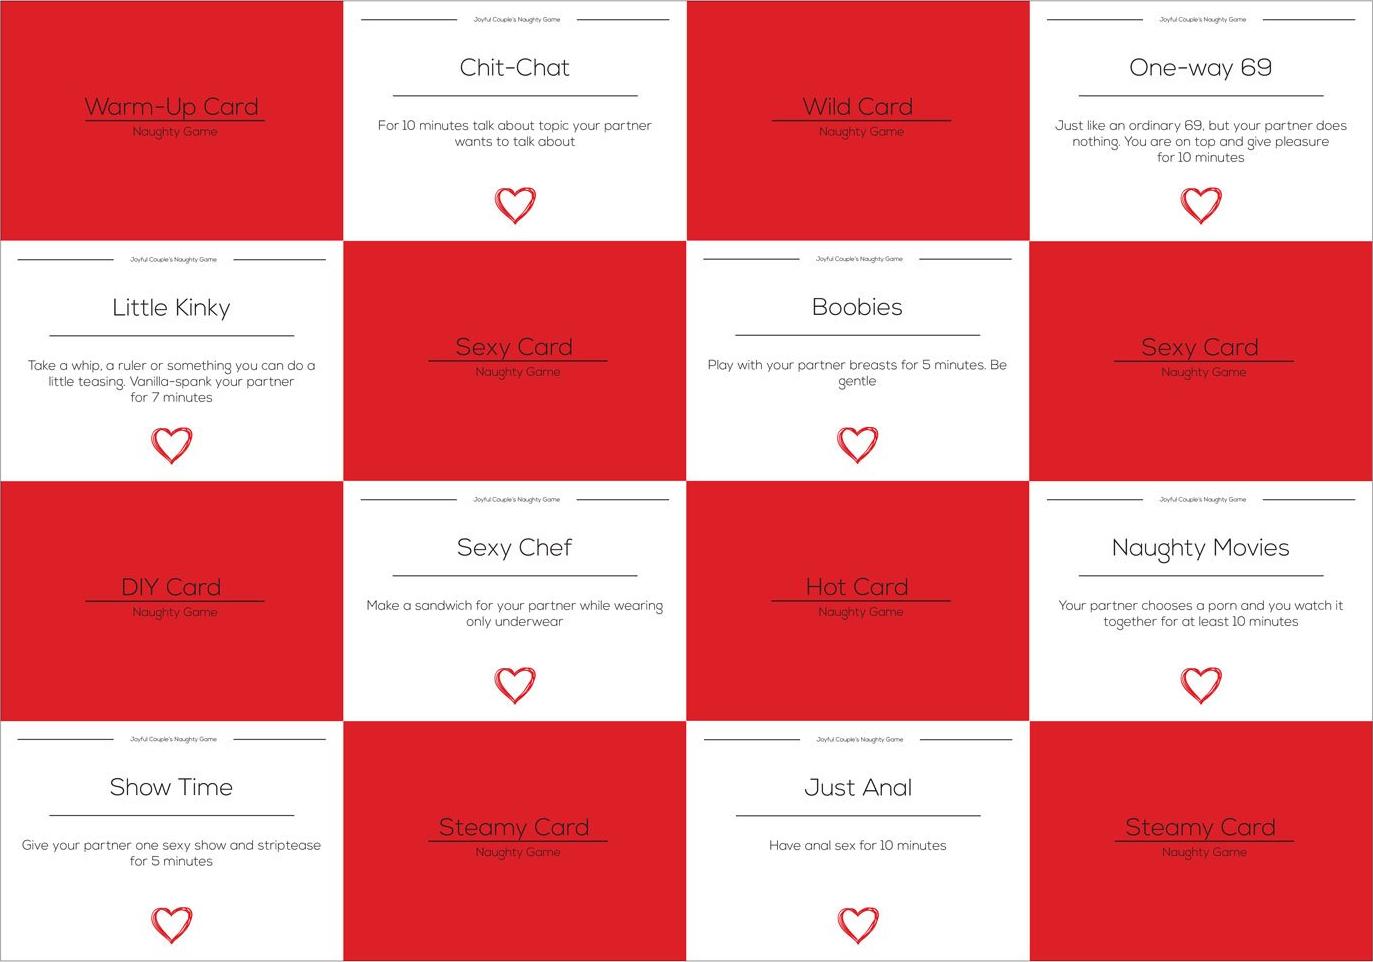 Joyful Couple Naughty Game example cards.